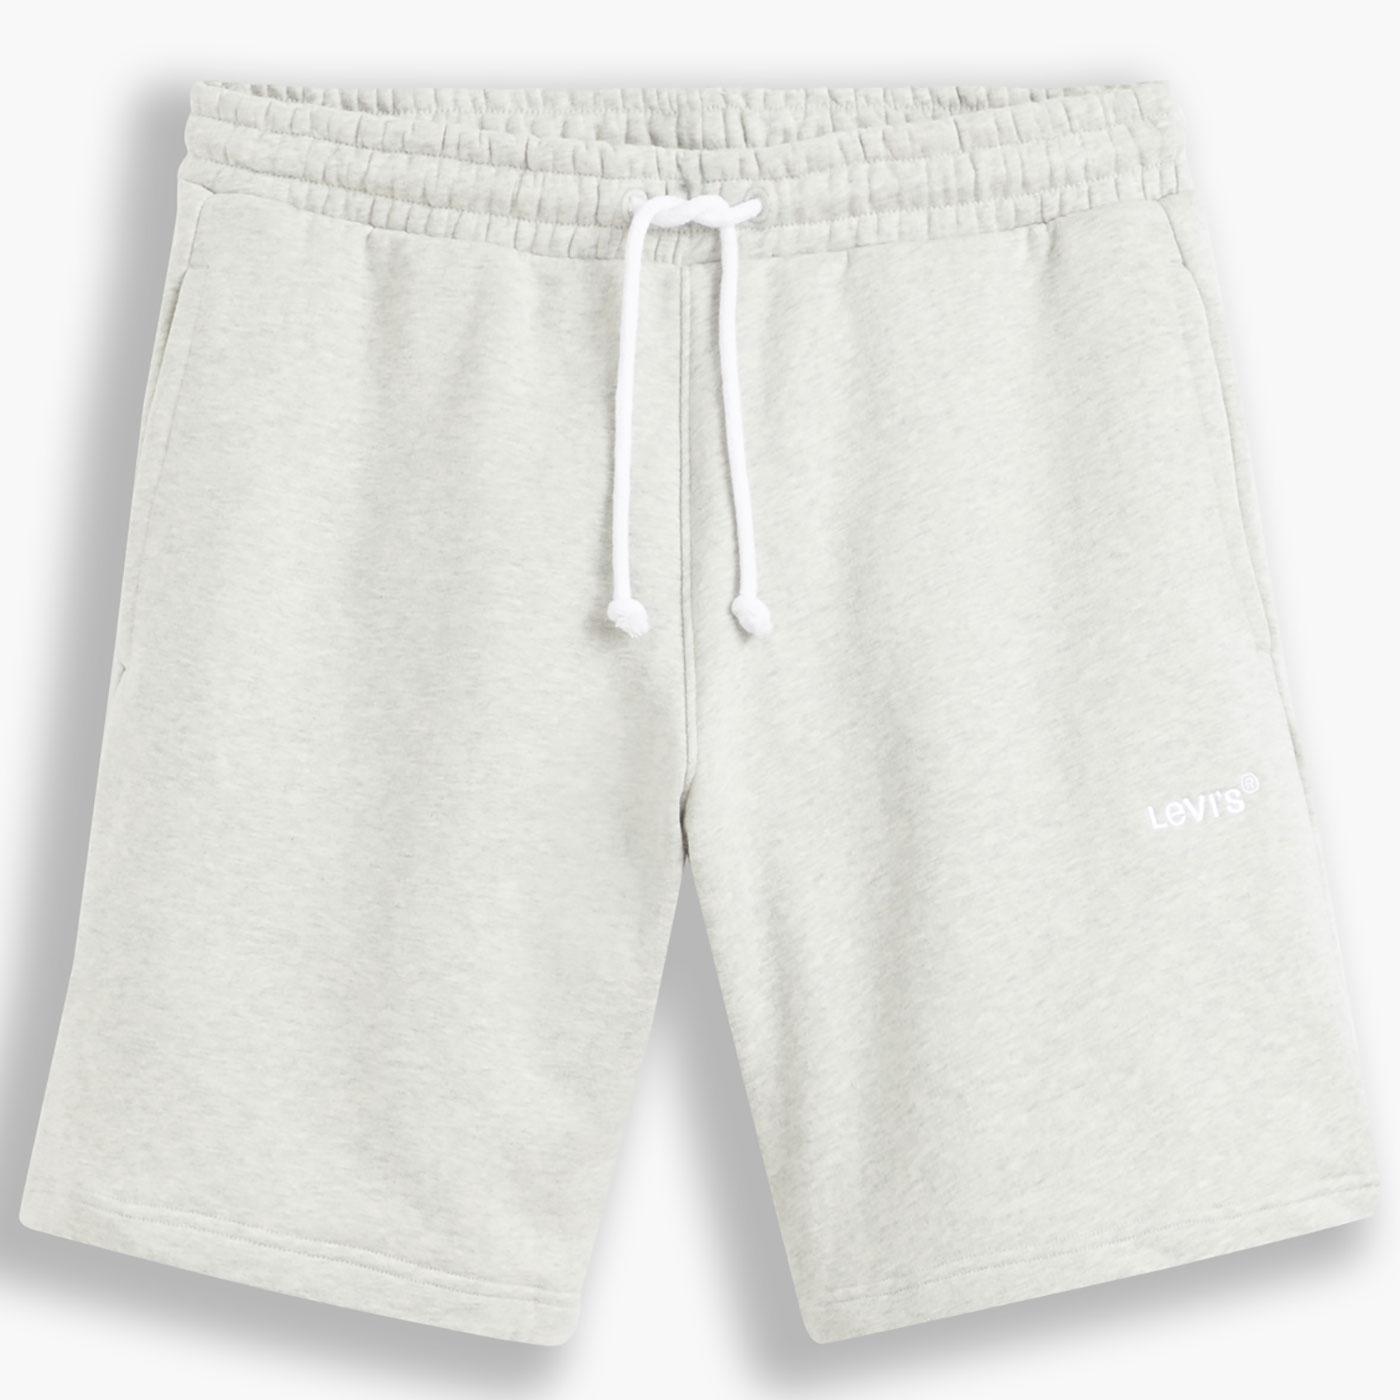 LEVI'S Red Tab Sweat Shorts (Light Mist Heather)